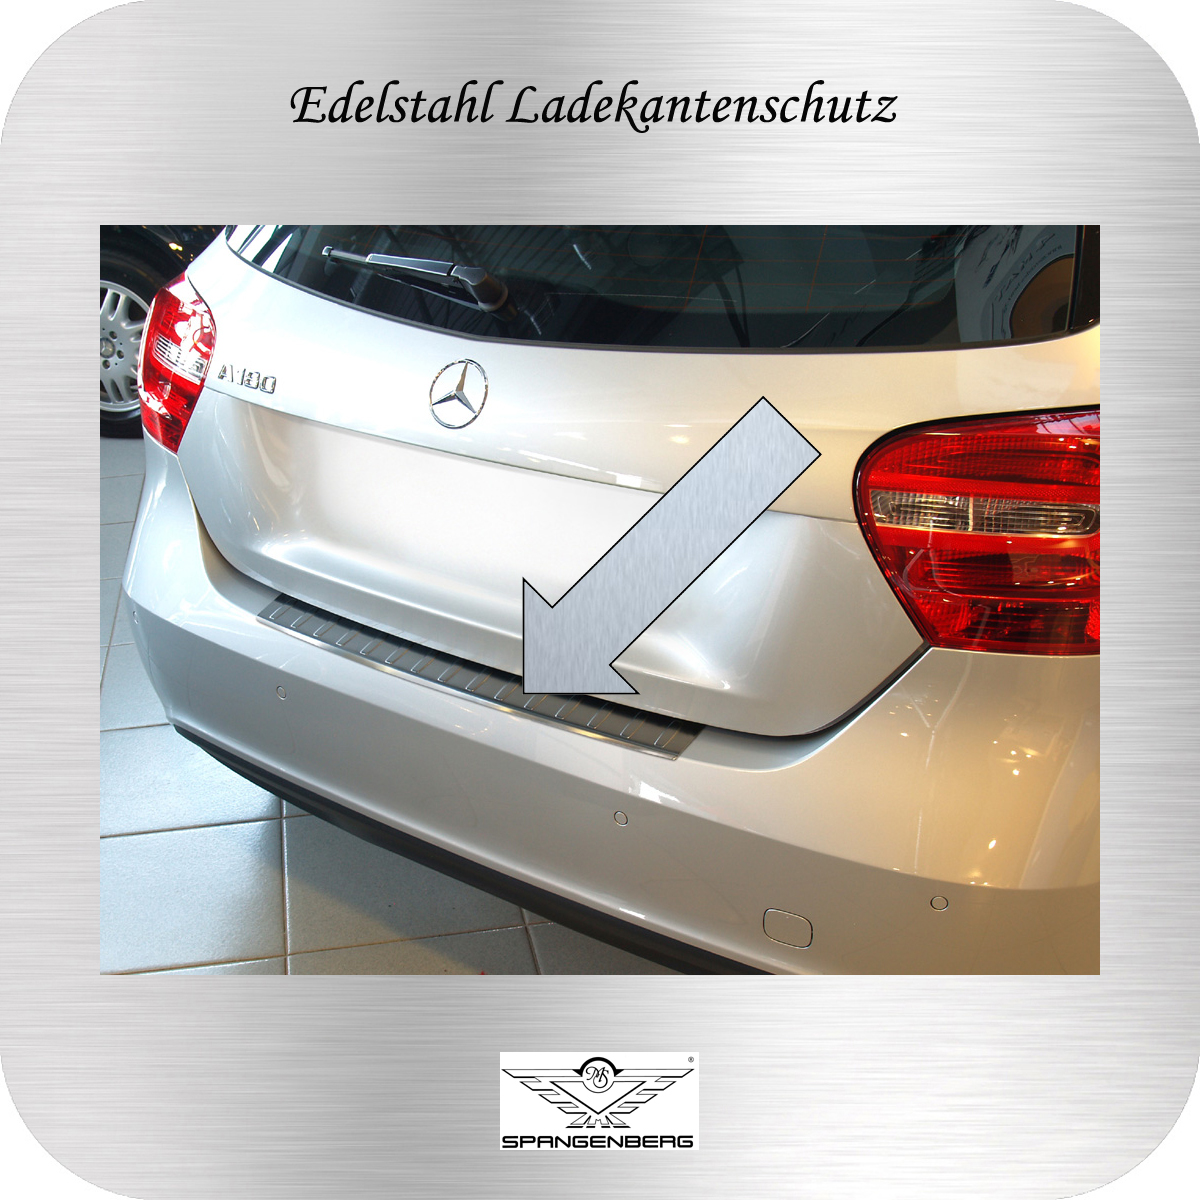 Ladekantenschutz Edelstahl Mercedes A-Klasse W176 2012- 3235664